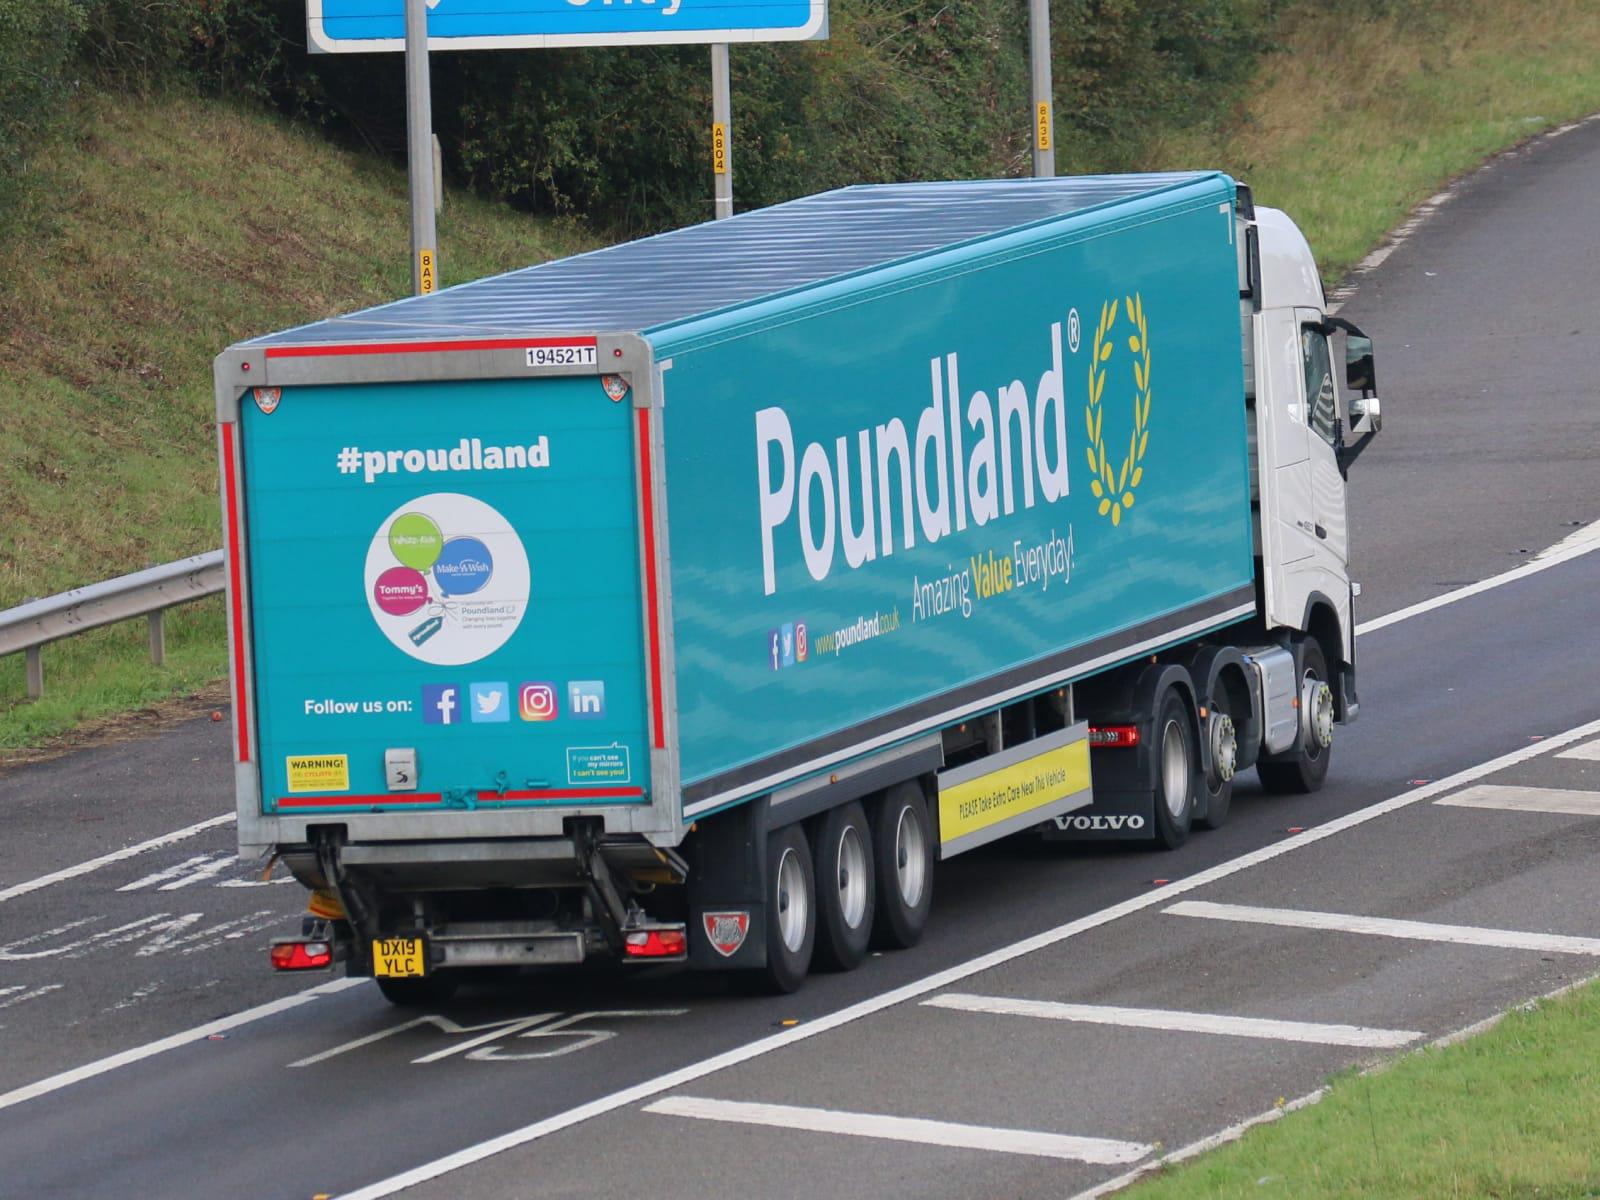 Tiger Poundland box van trailer spot by Tim Pickford truck photography